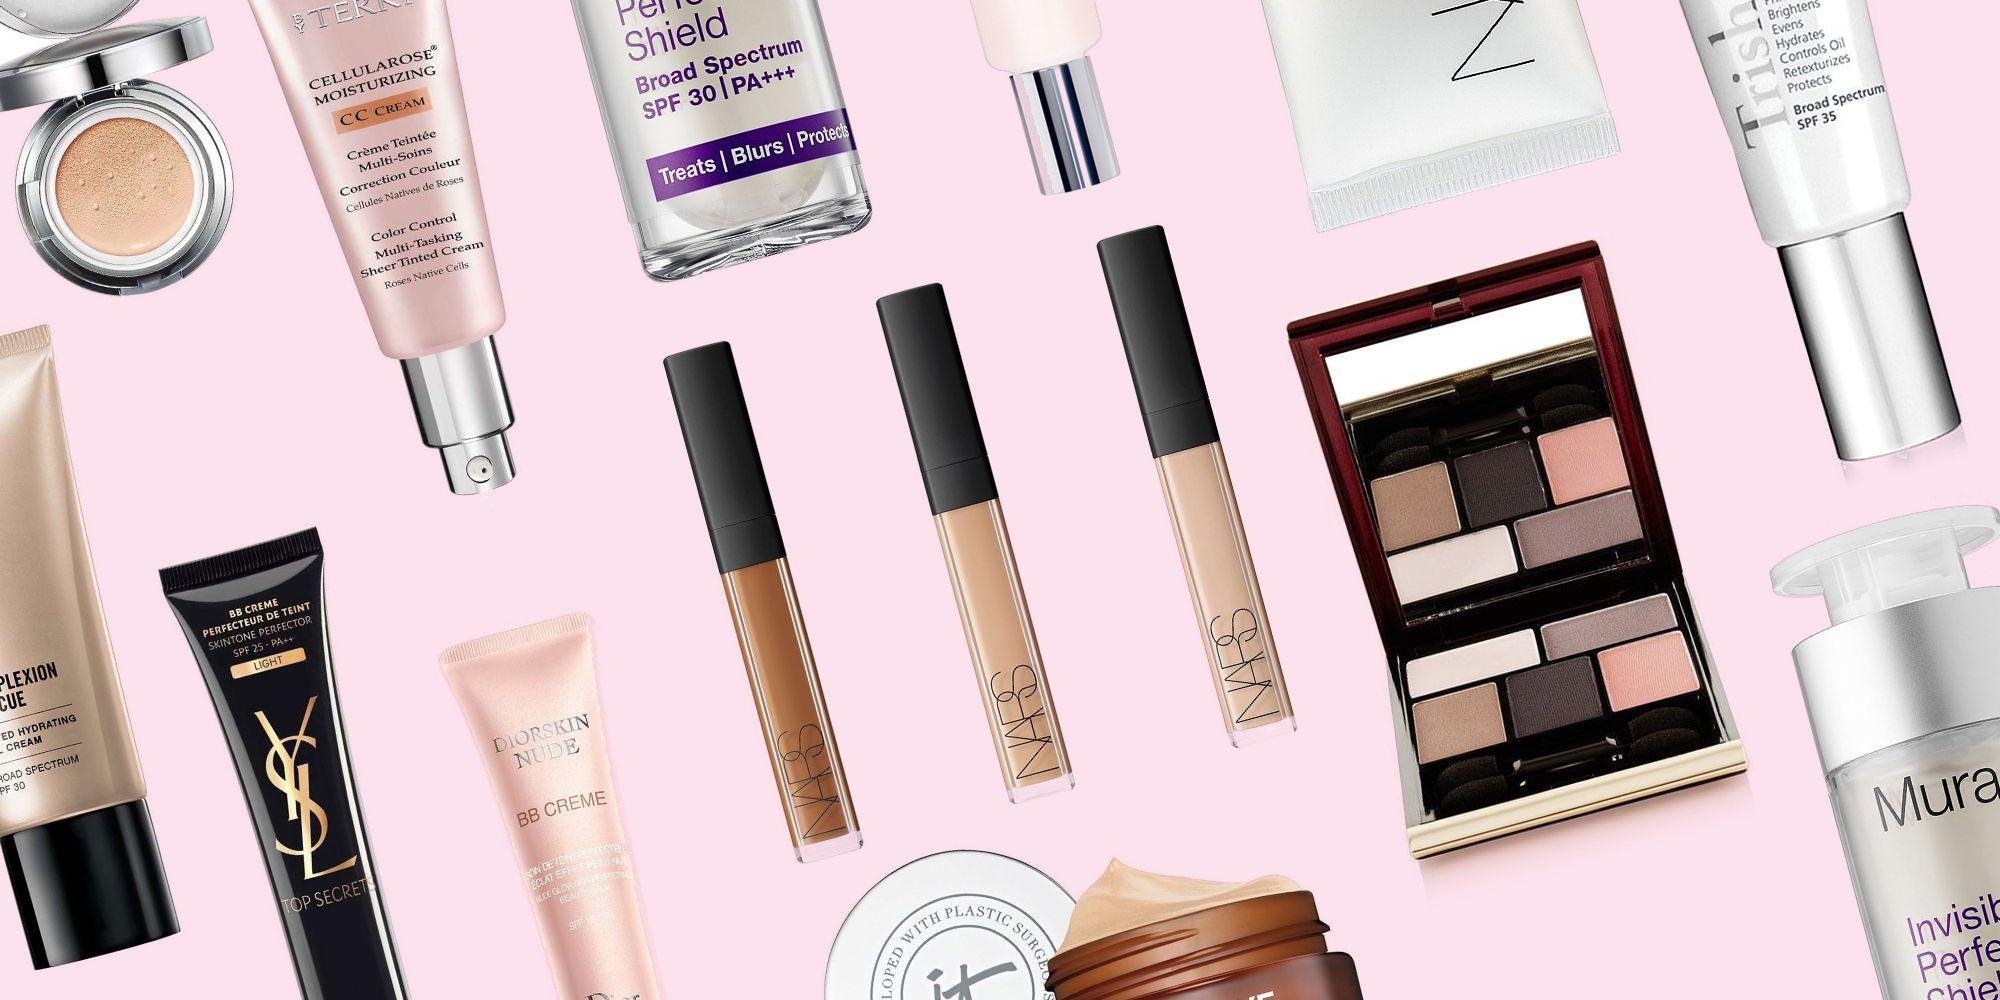 Cosmetics for mature women